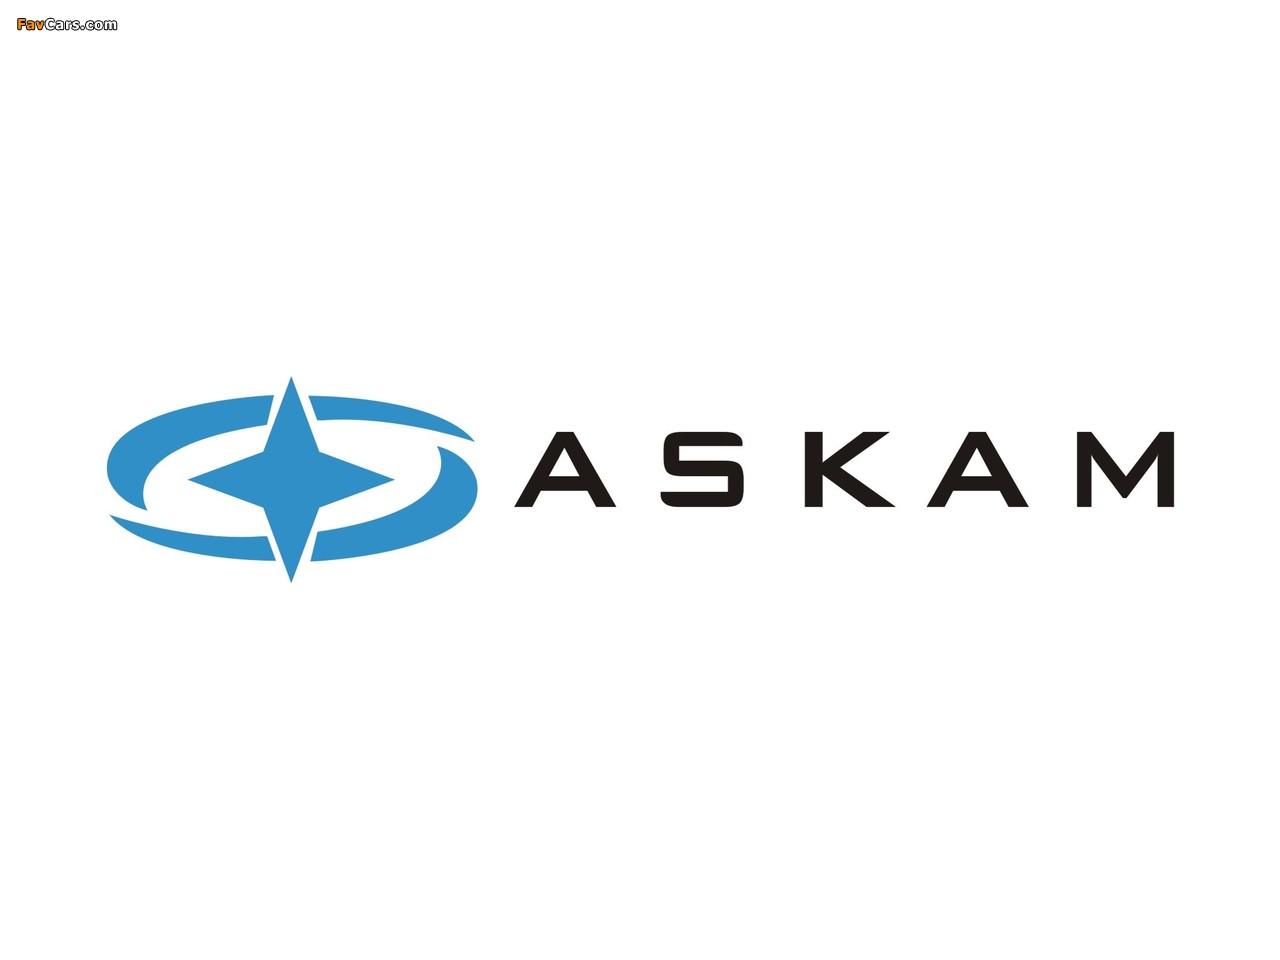 Photos of Askam (1280 x 960)